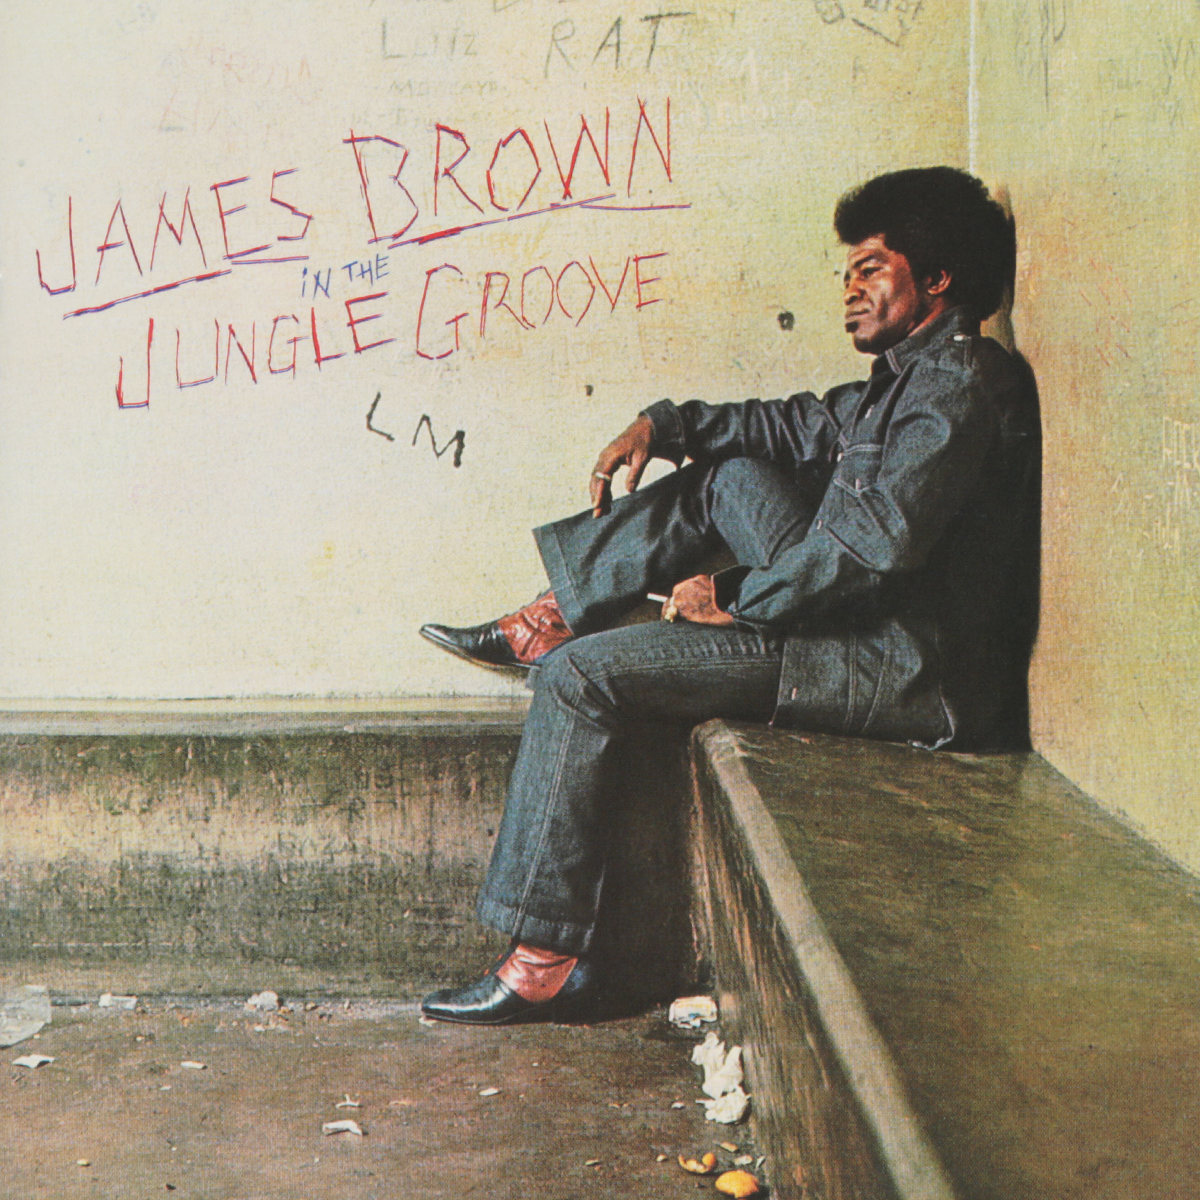 Джеймс Браун James Brown. In The Jungle Groove james brown james brown night train colour